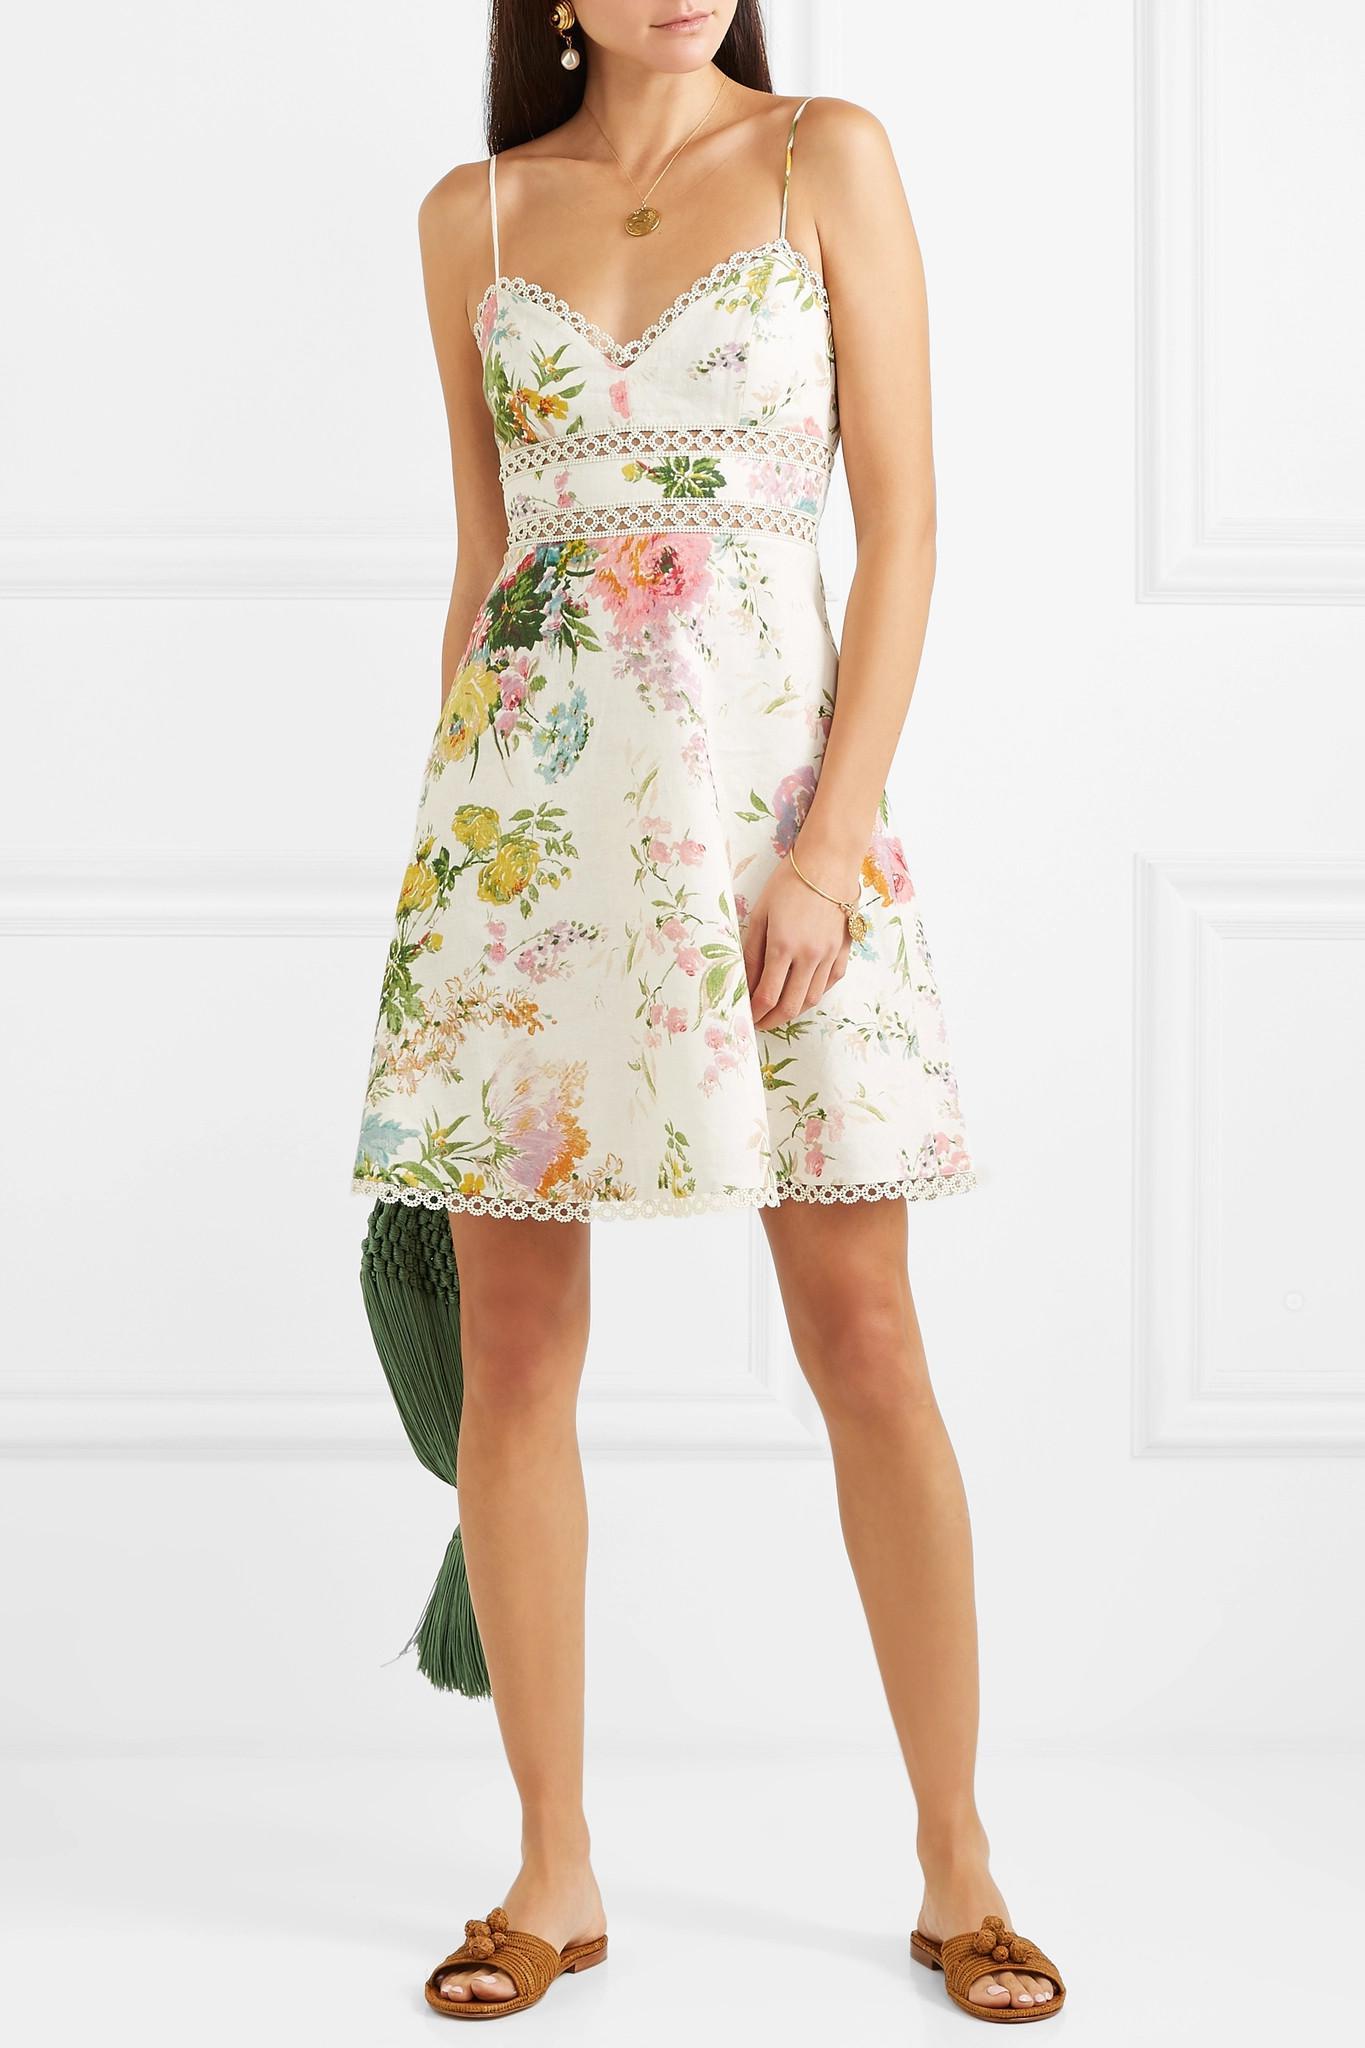 aff3d076326 Zimmermann - Multicolor Heather Lace-trimmed Floral-print Linen Mini Dress  - Lyst. View fullscreen